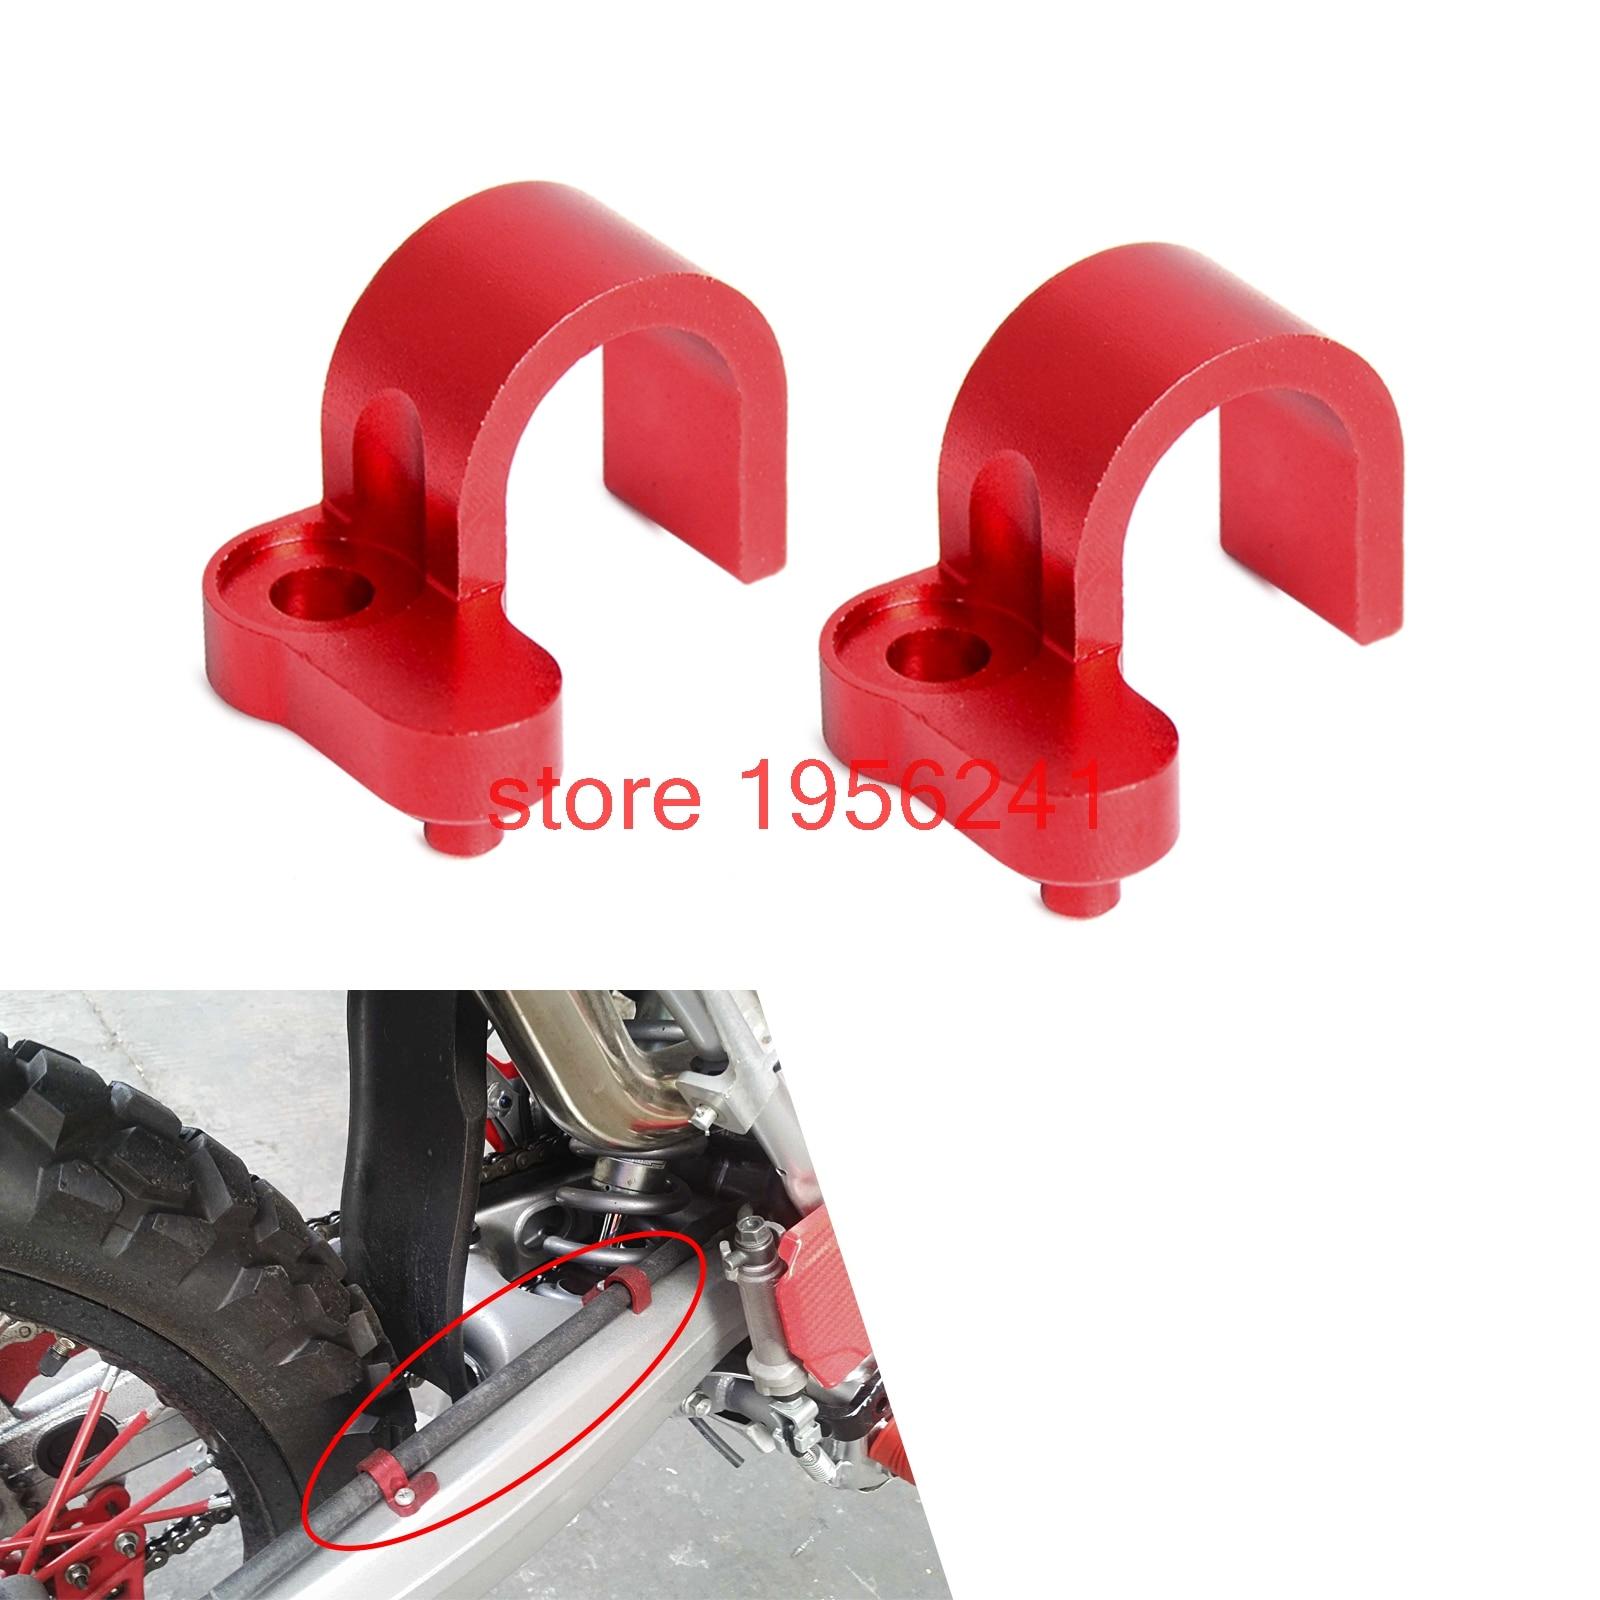 CNC Rear Brake Line Hose Clamp Holder For Honda CRF250L CRF250M 2012 - 2015 2013 2014 CRF250 L/M